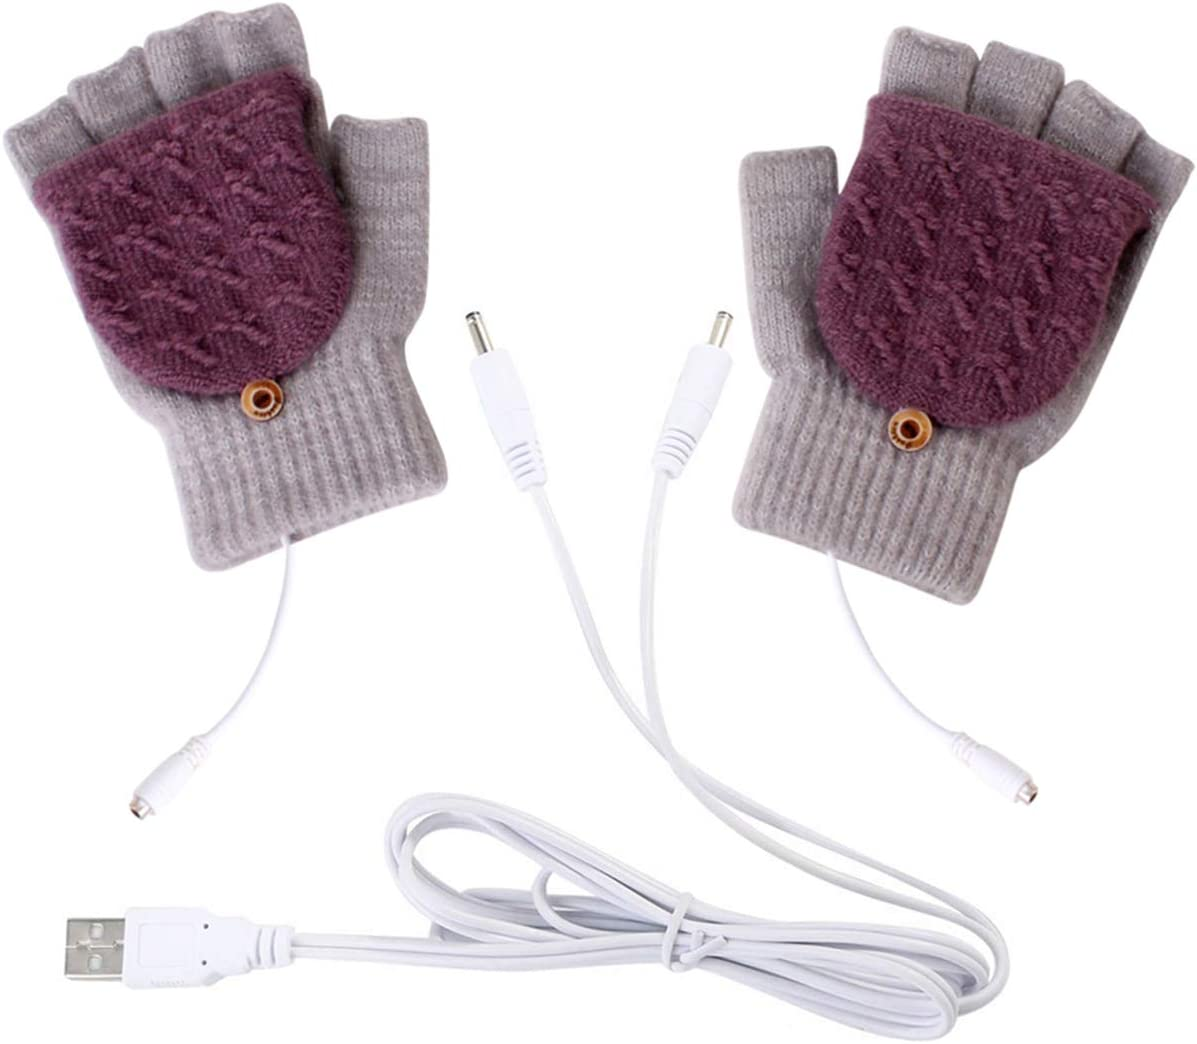 oenbopo USB Heated Gloves Winter Half Fingers USB Heating Warm Gloves (Brown)